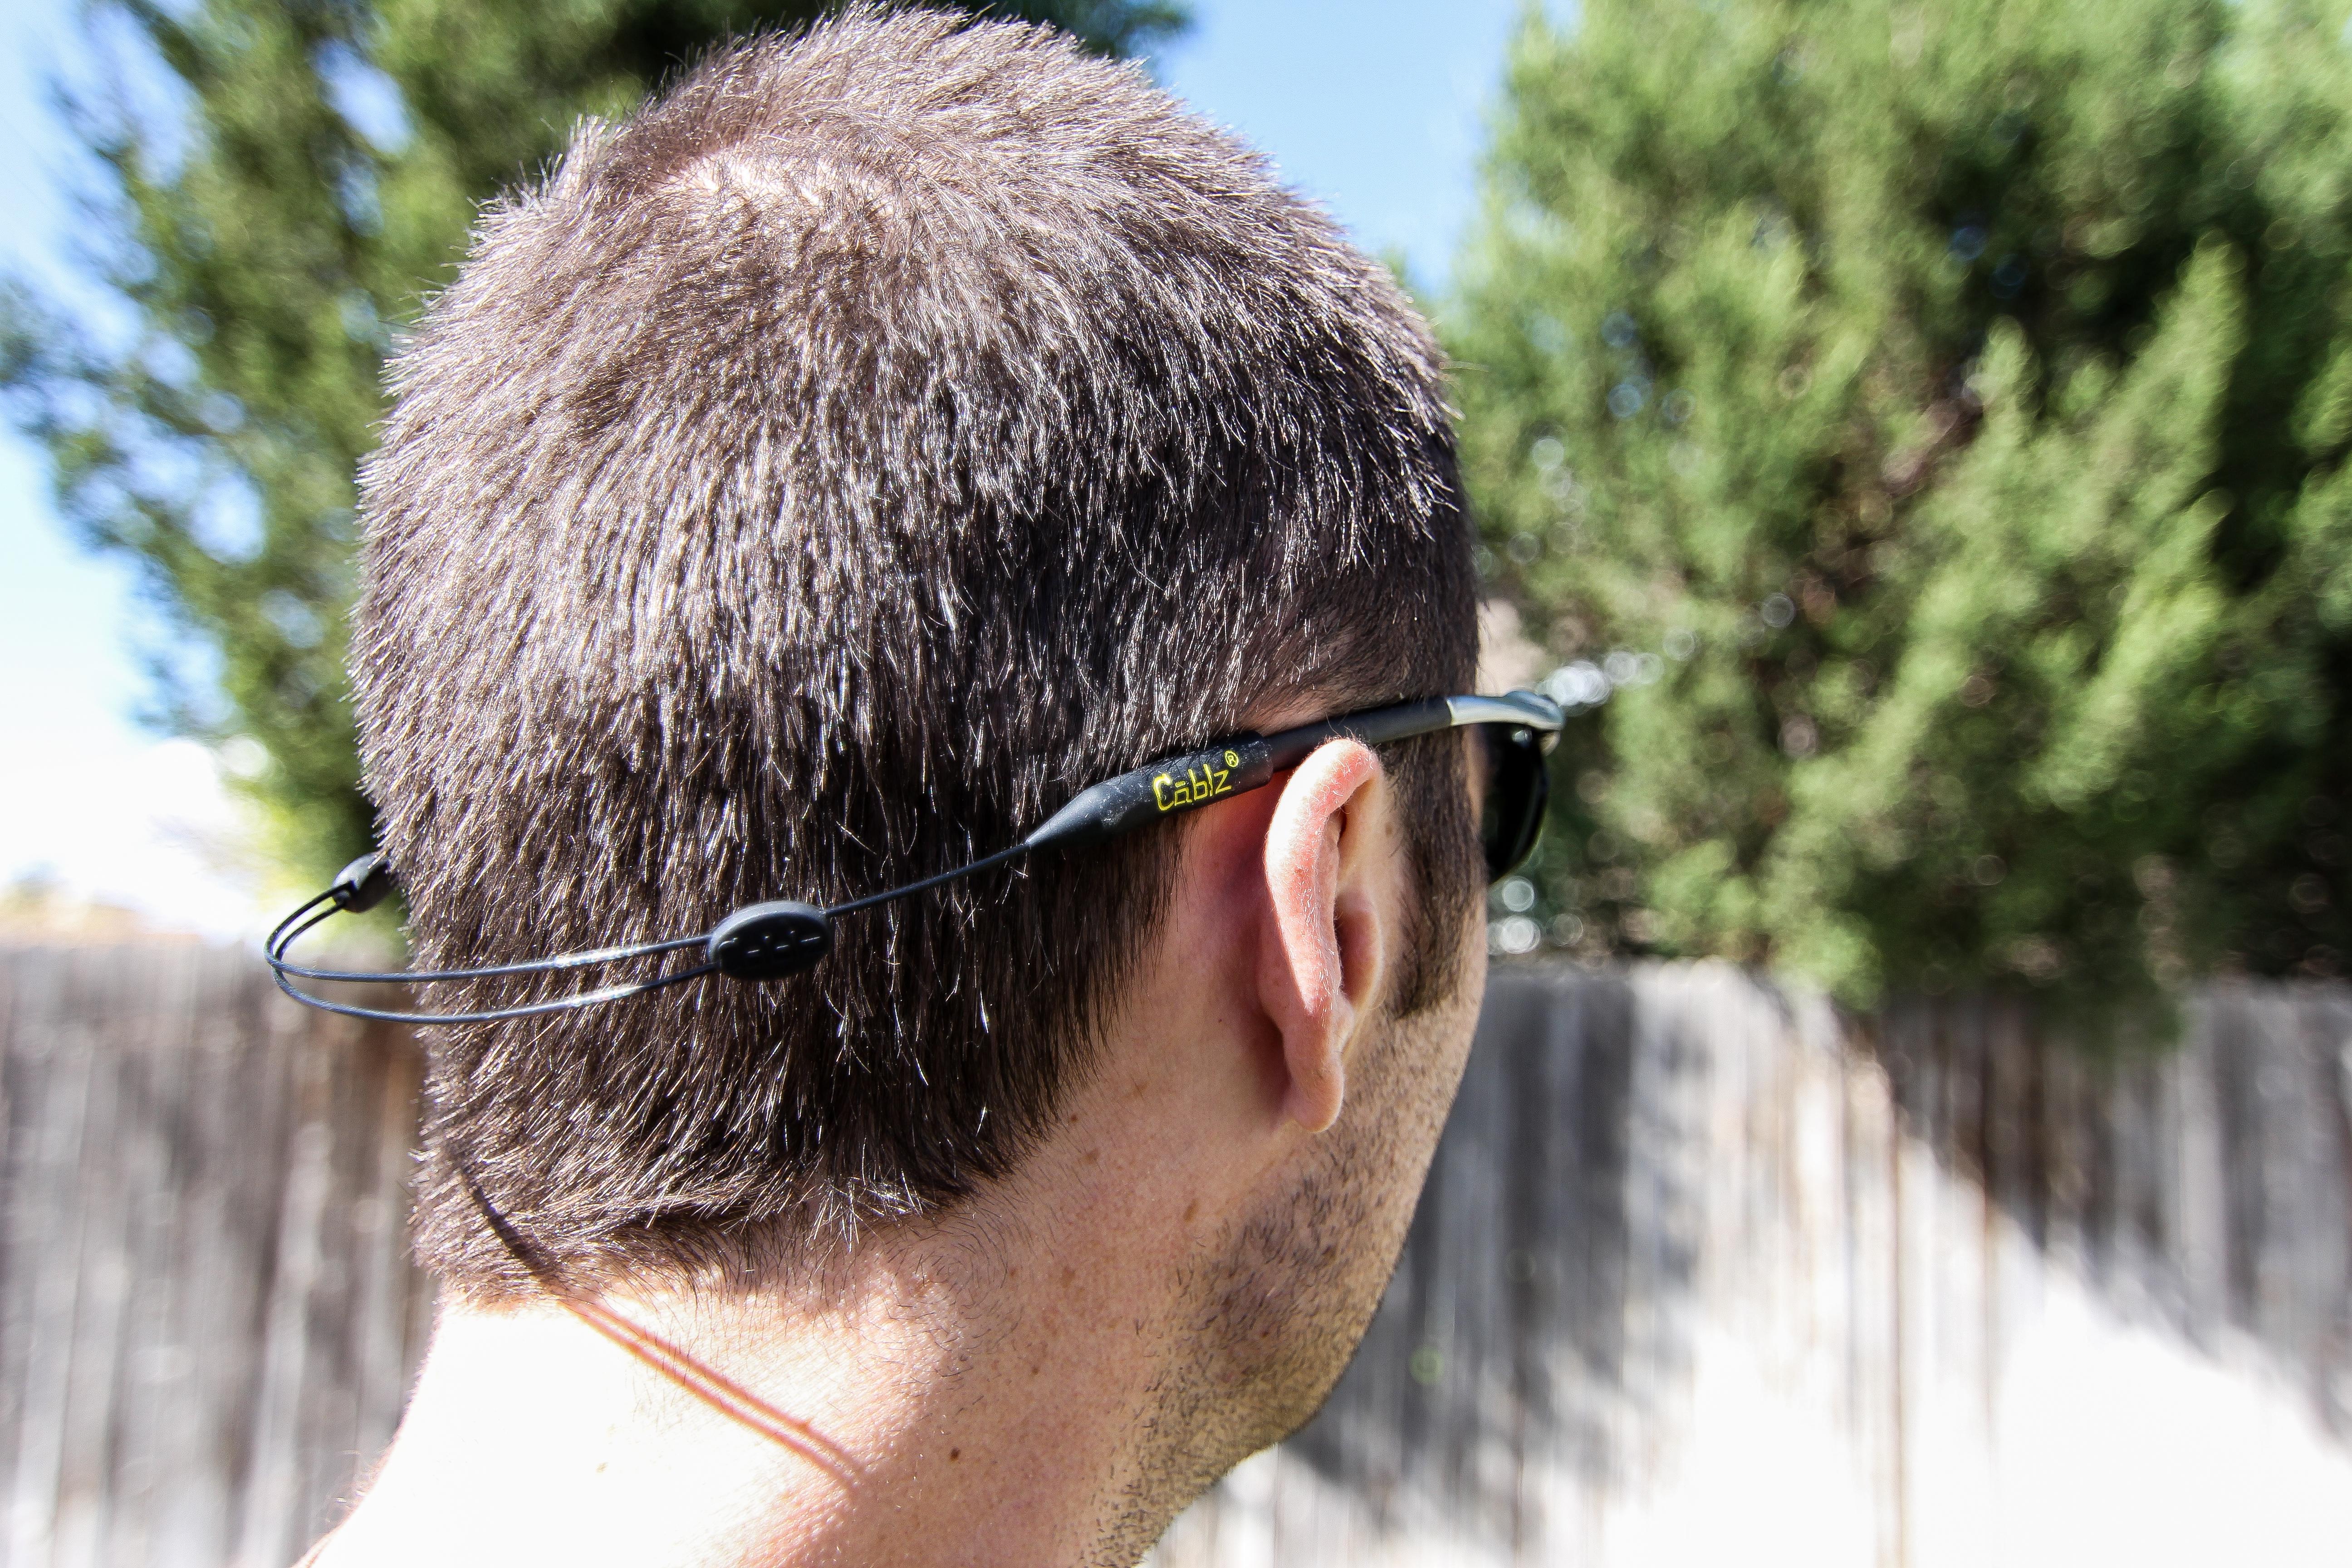 Cablz Zipz Eyewear Review